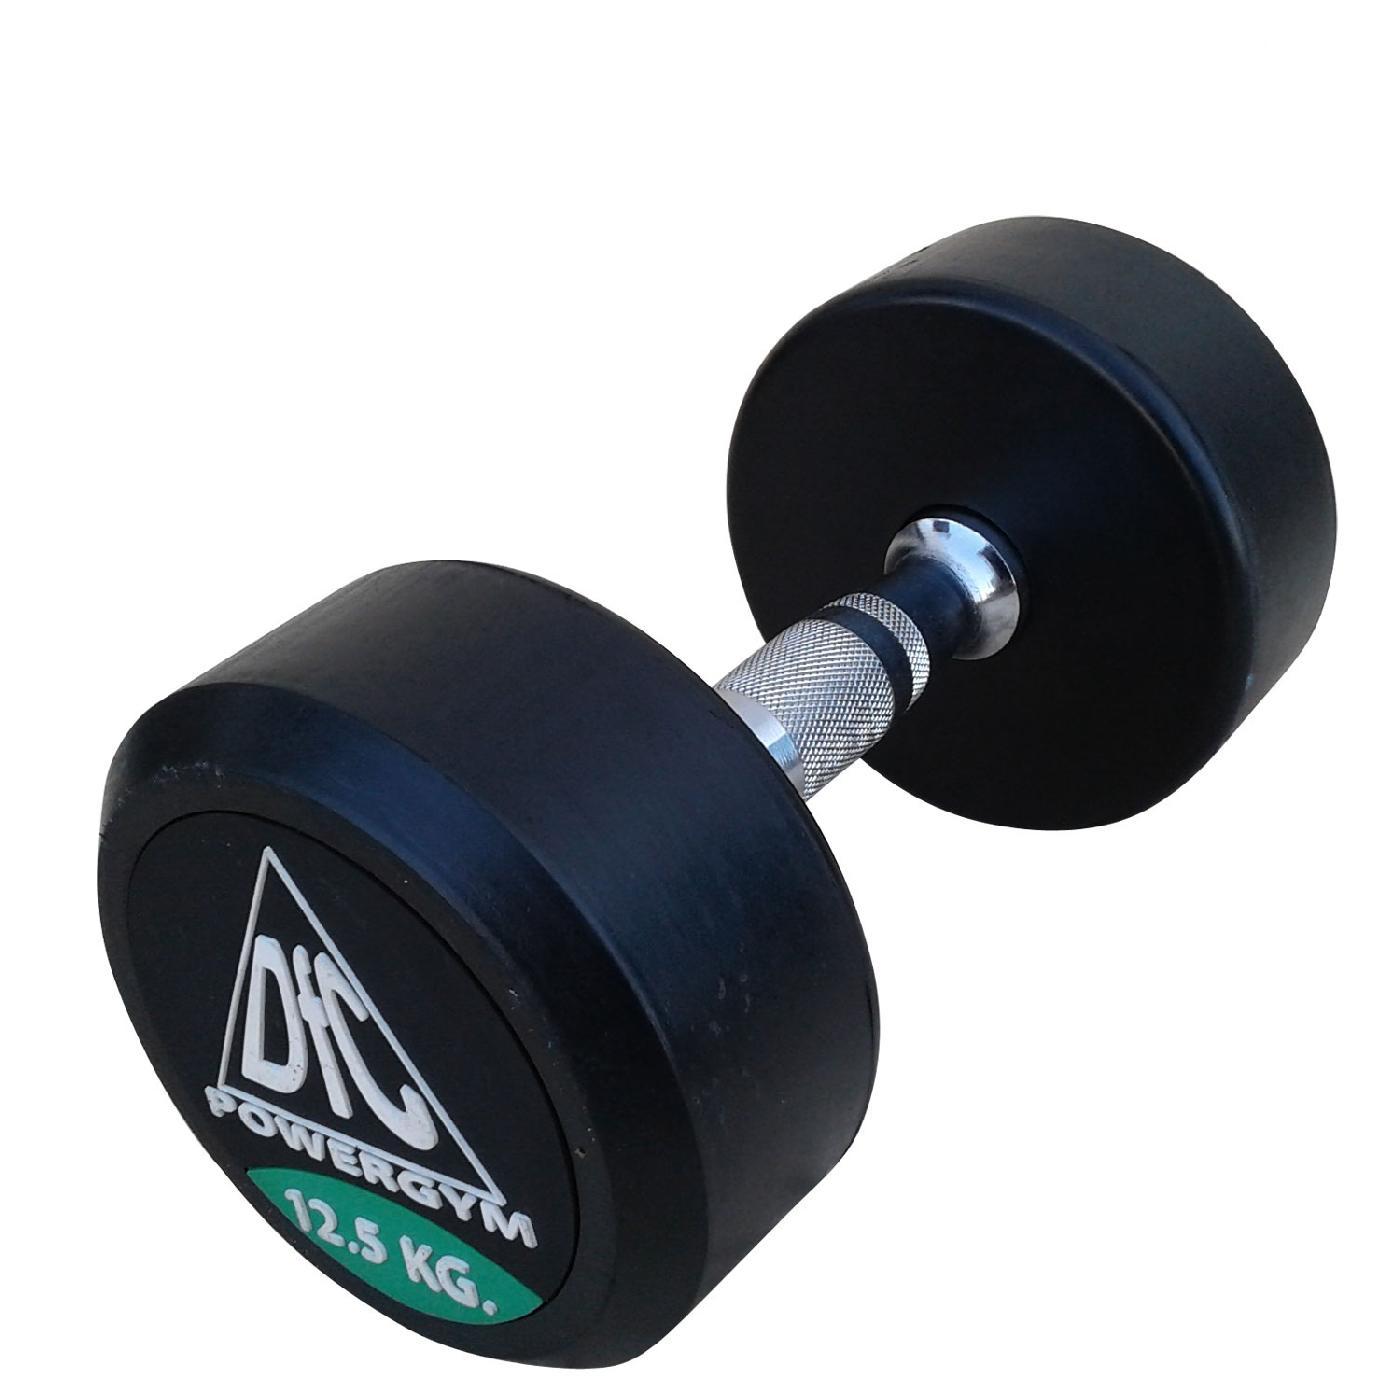 Гантели пара 12.5кг DFC POWERGYM DB002-12.5